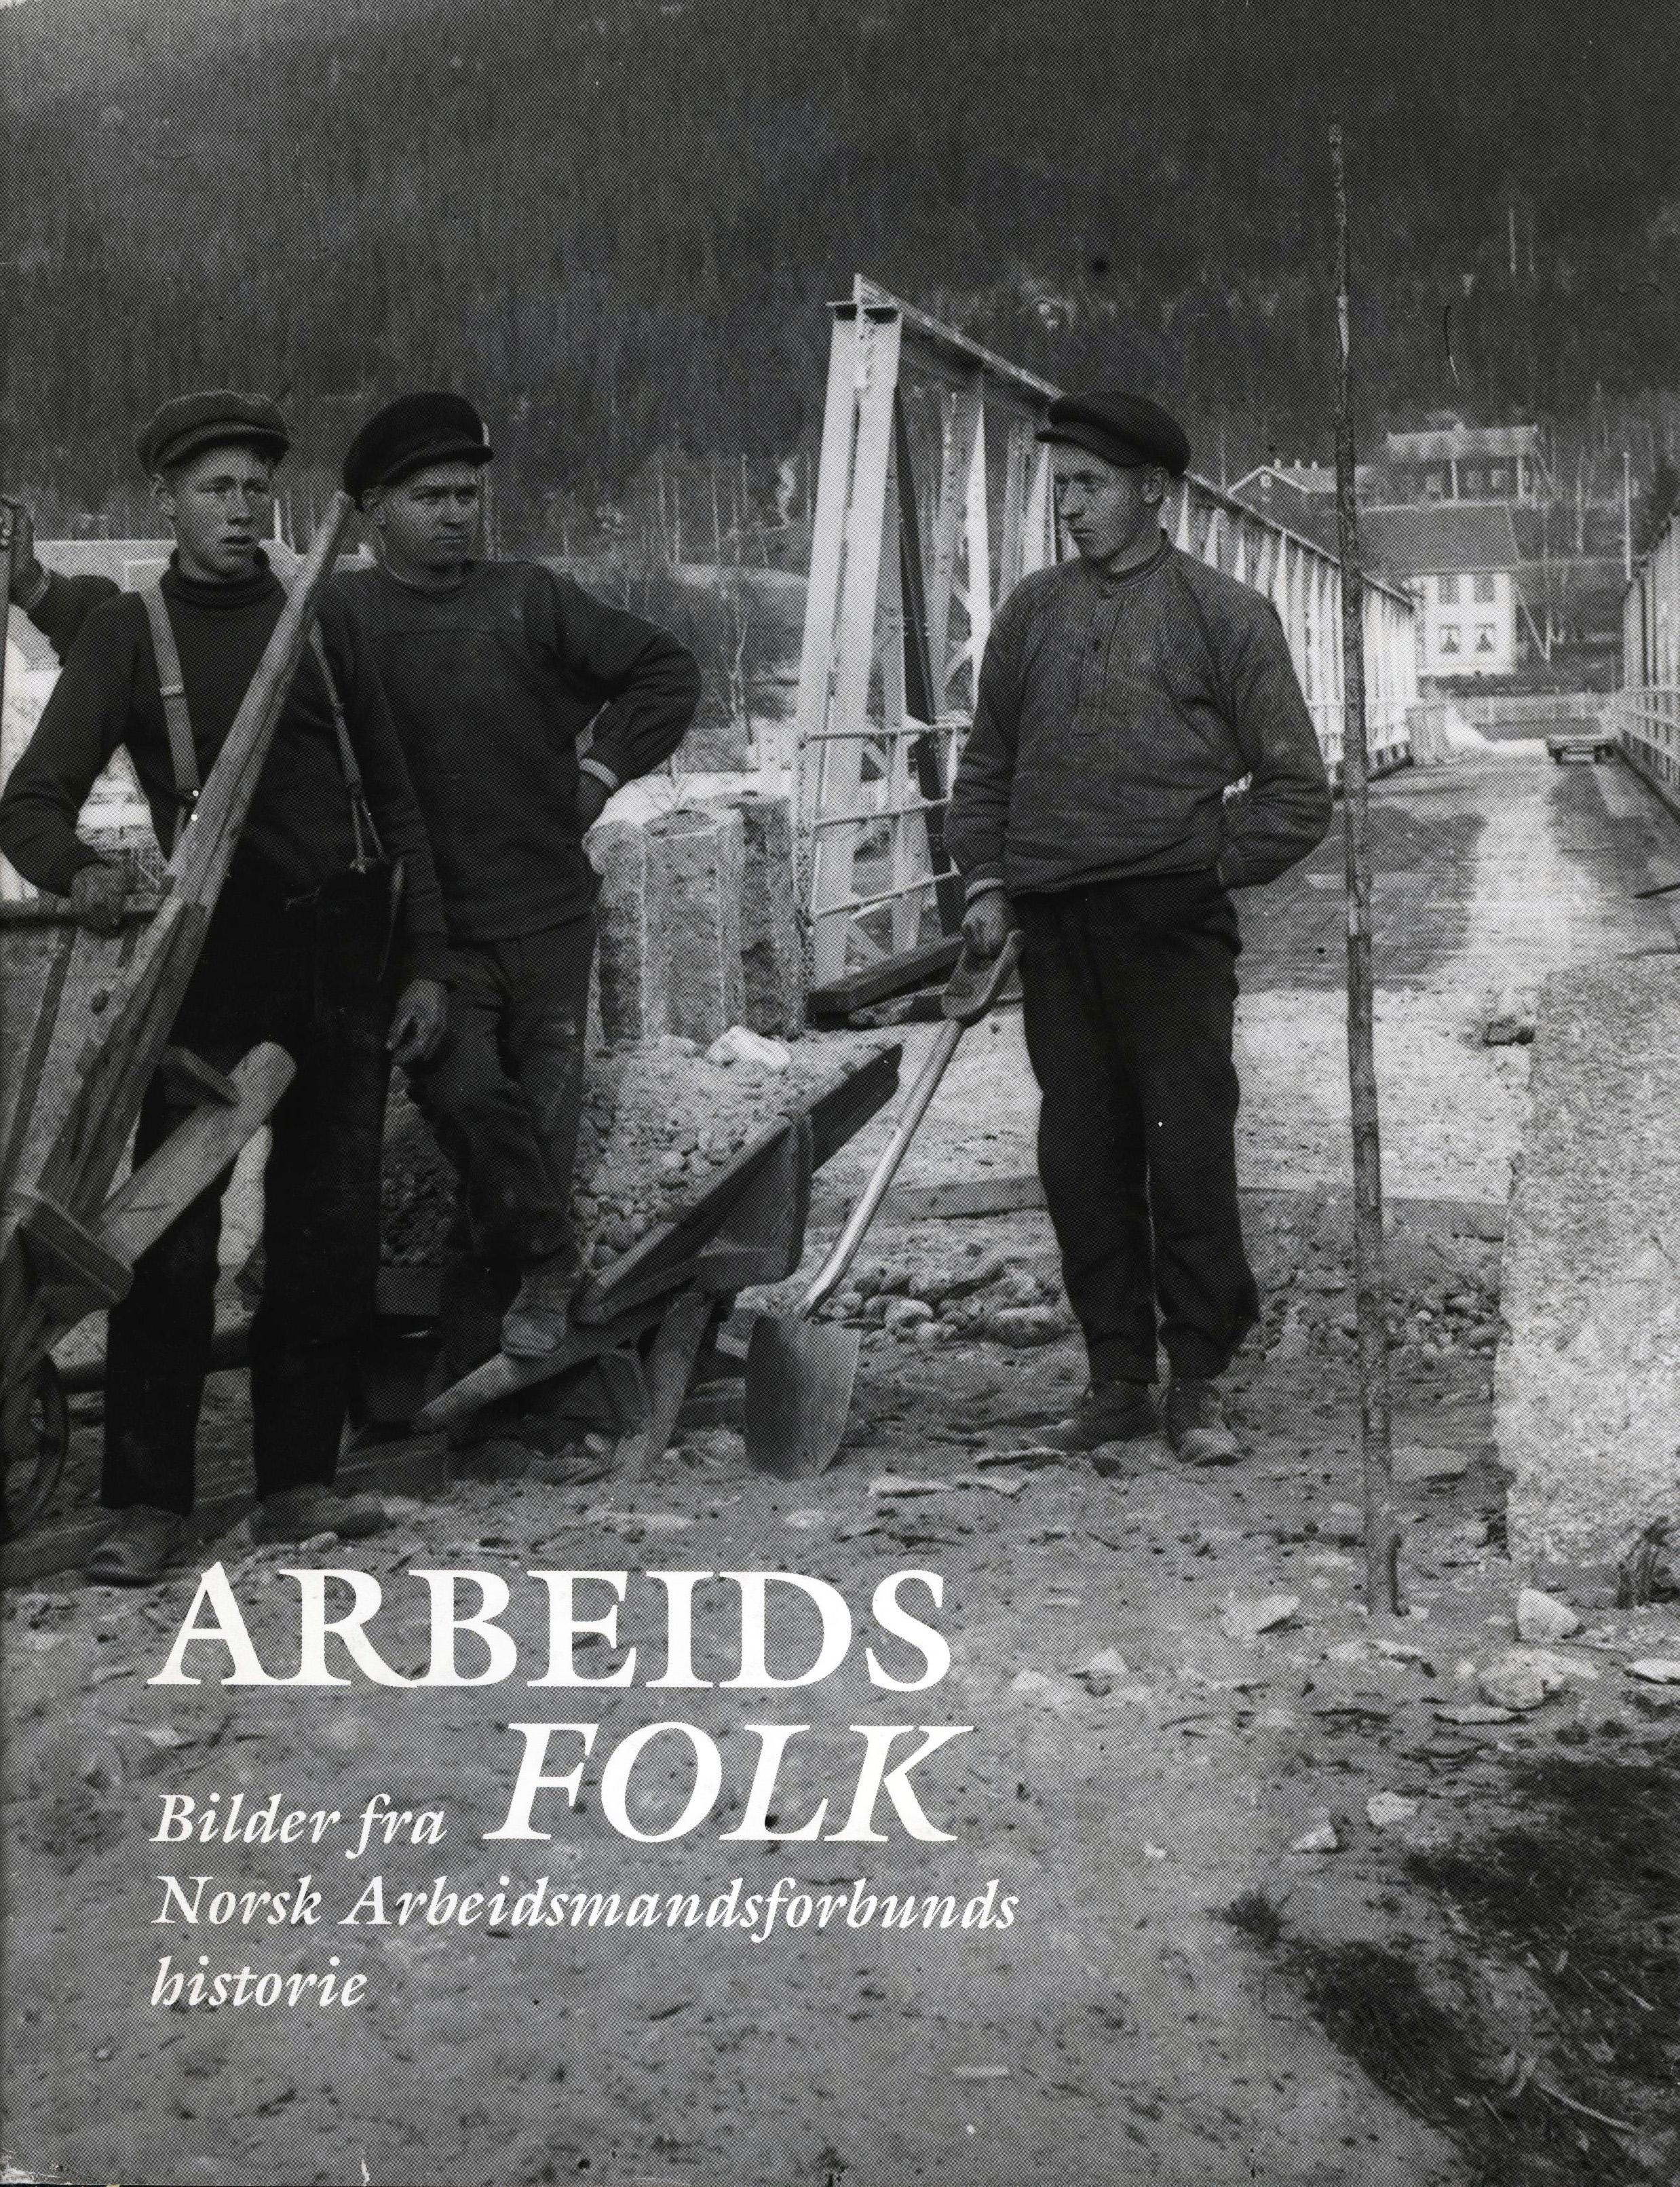 Solveig Halvorsen, Lill-Ann Jensen: Arbeidsfolk - Bilder fra Norsk Arbeidsmandsforbunds historie